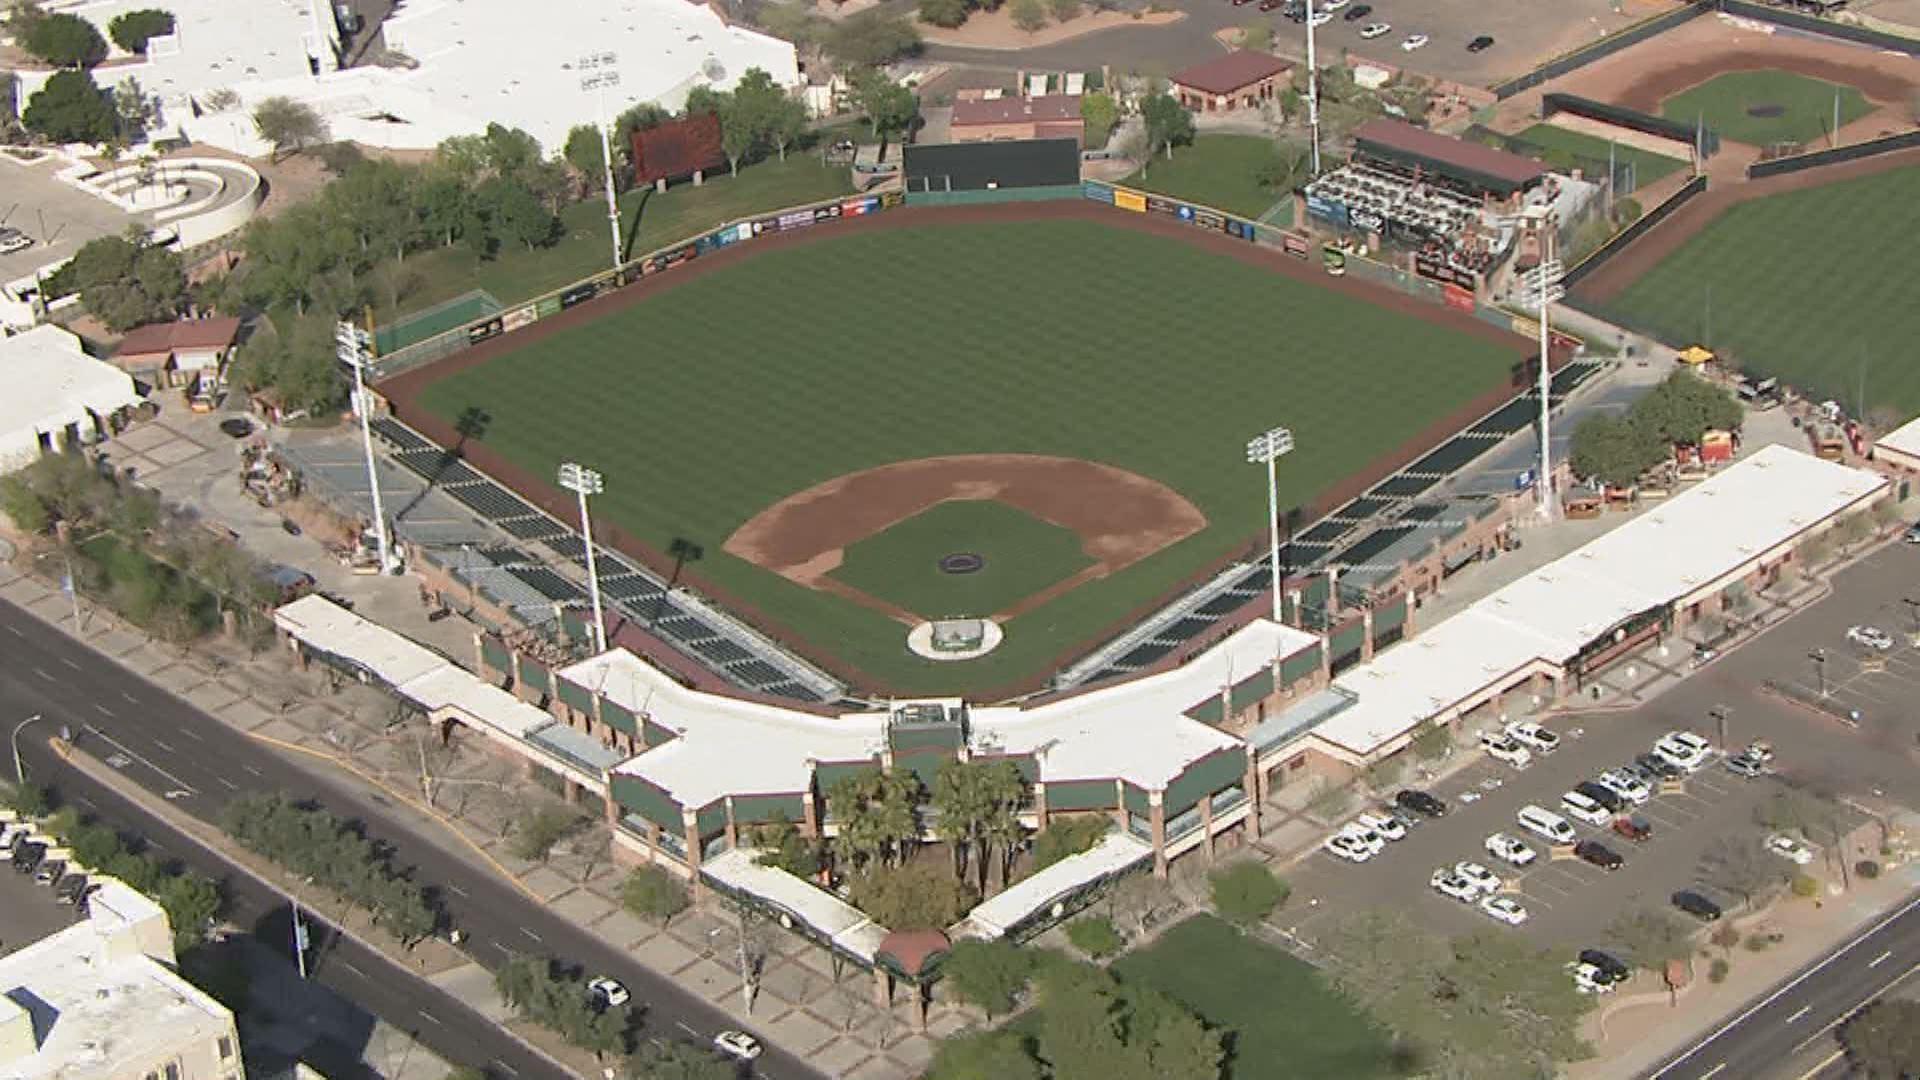 100 Dodger Stadium Parking Map Ppg Paints Arena